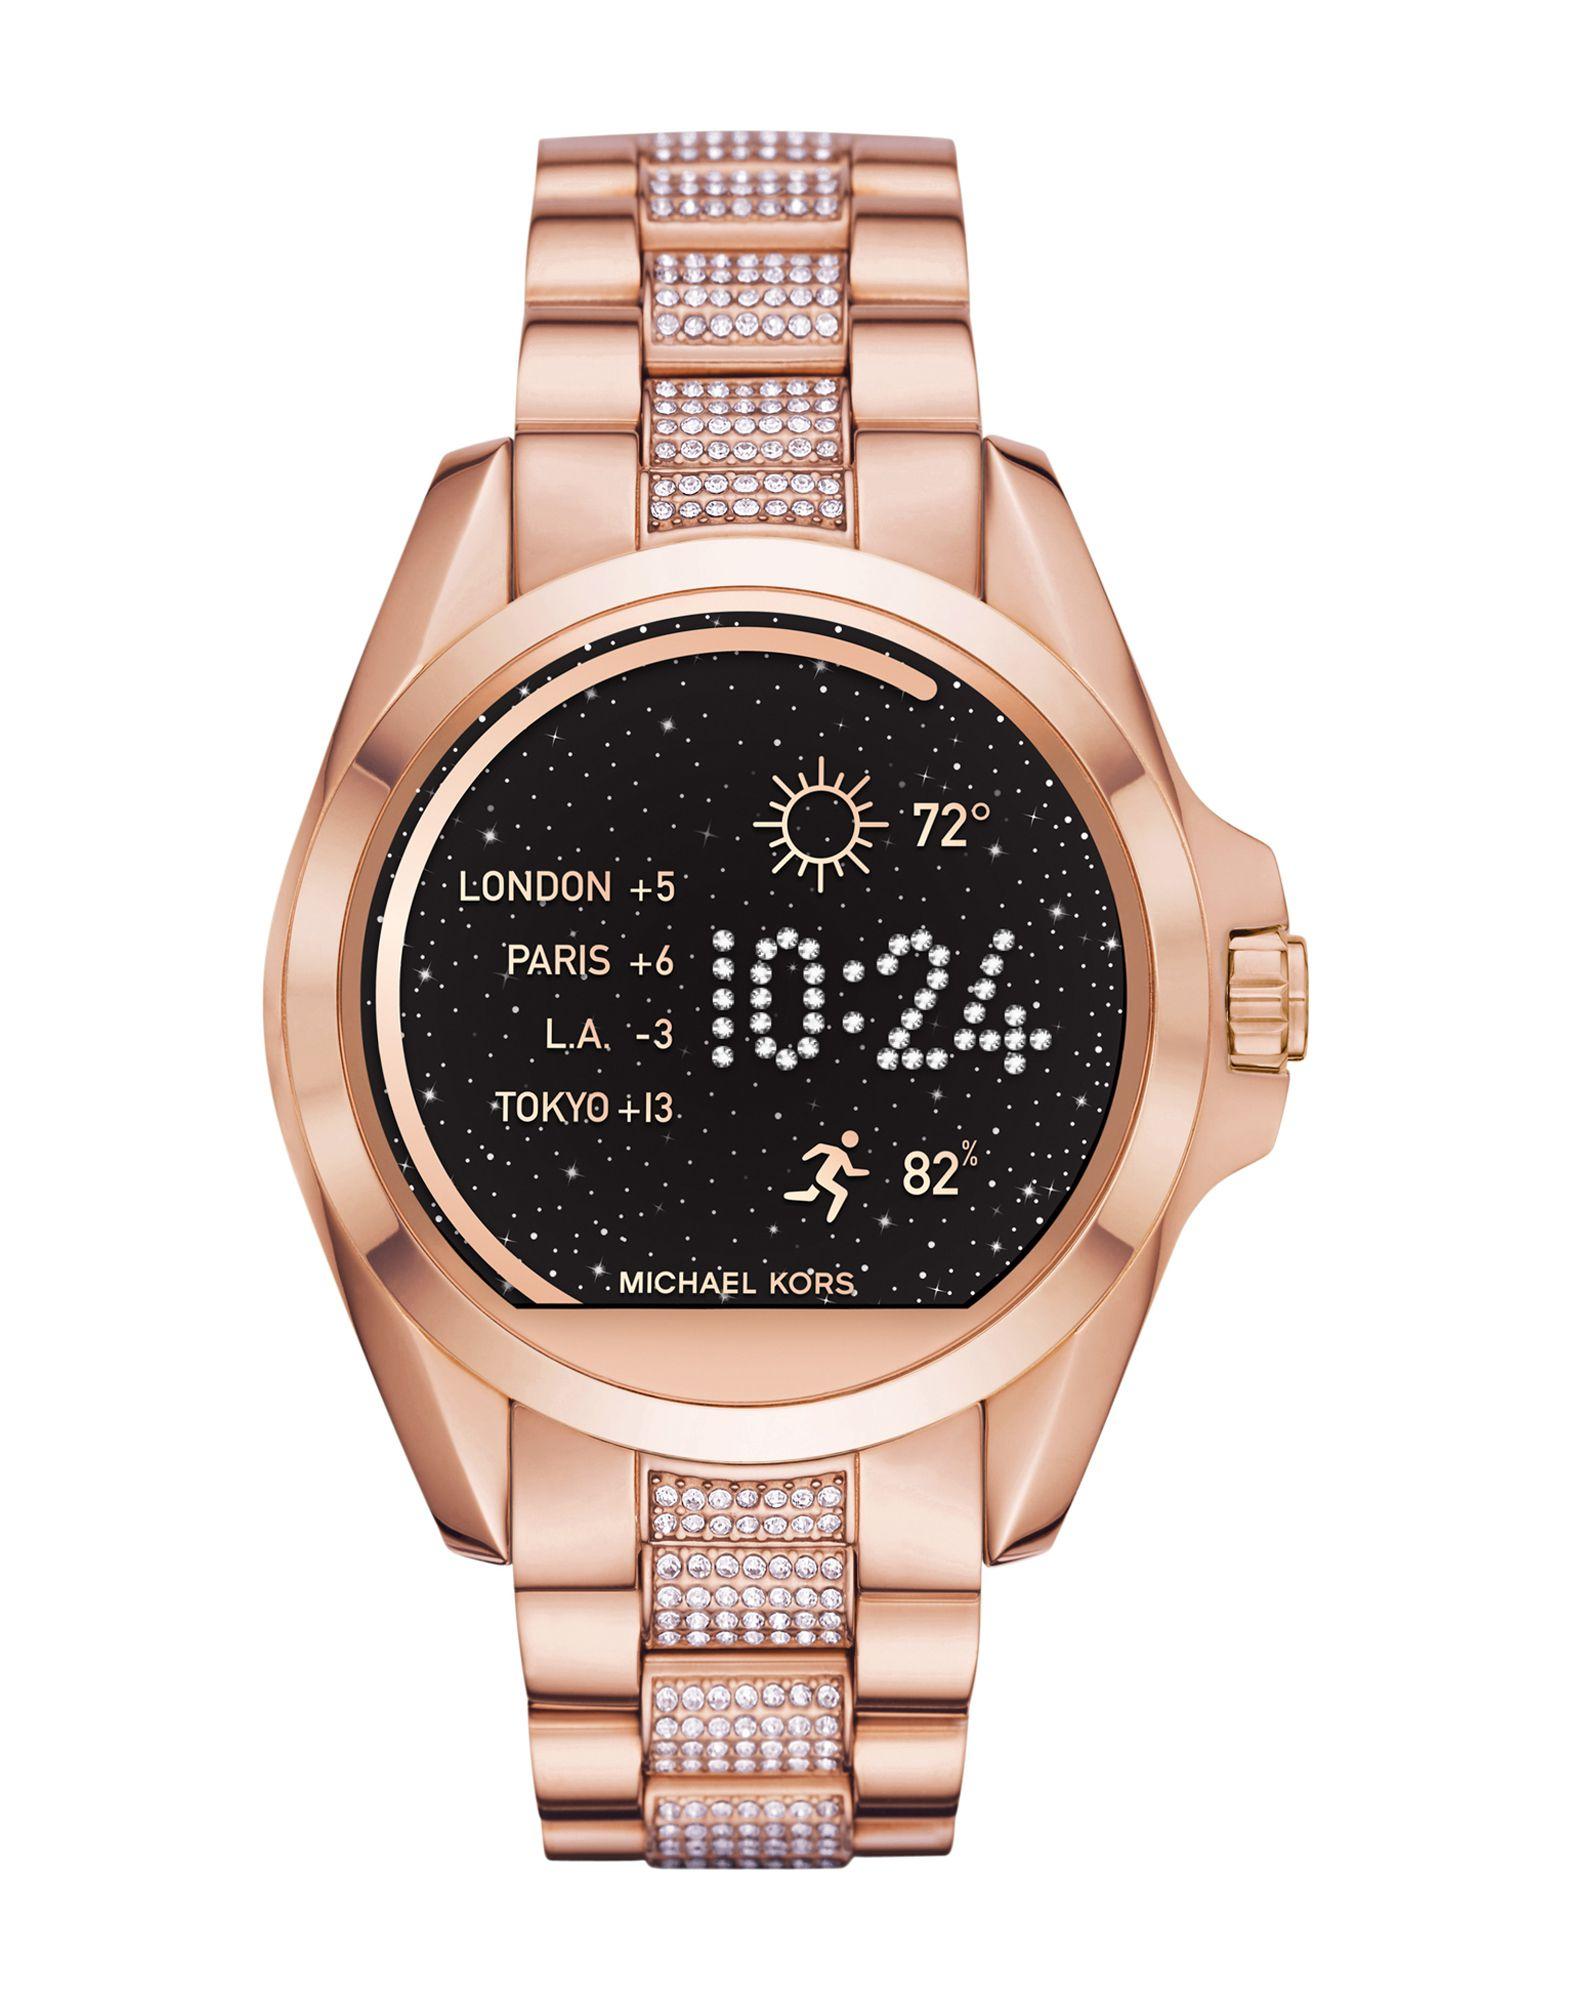 MICHAEL KORS ACCESS Damen Smartwatch Farbe Kupfer Größe 1 - broschei